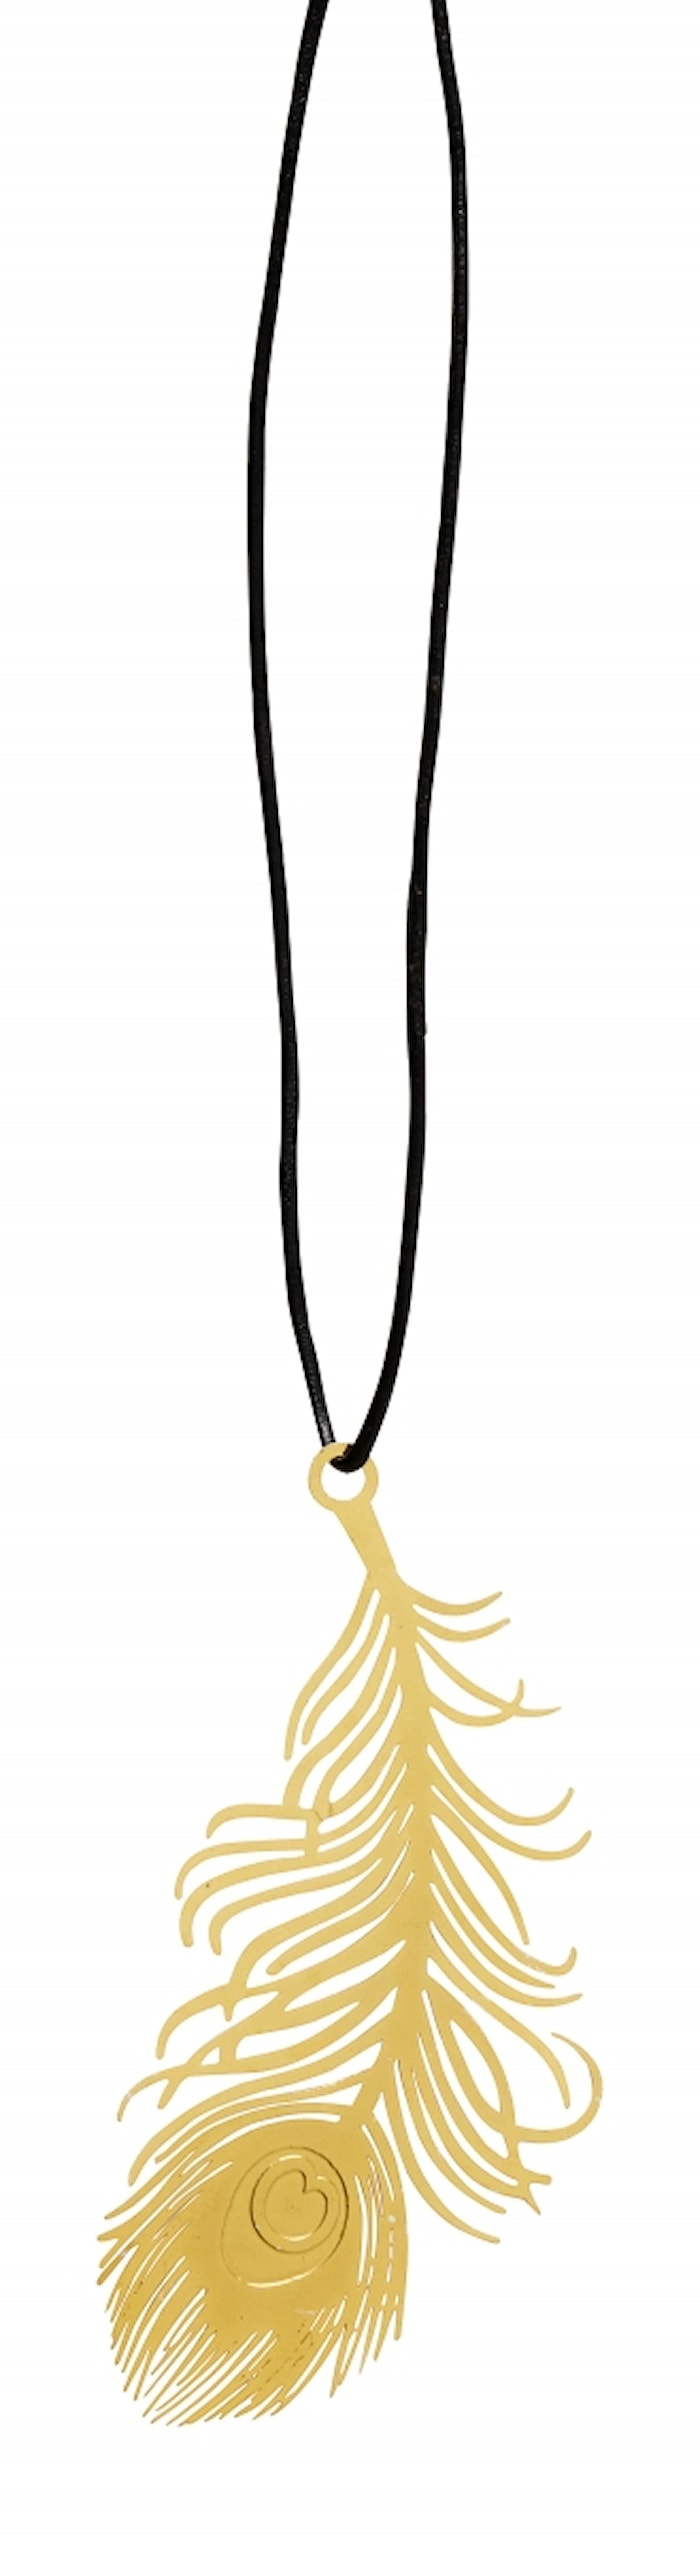 Juldekoration Metal Feather